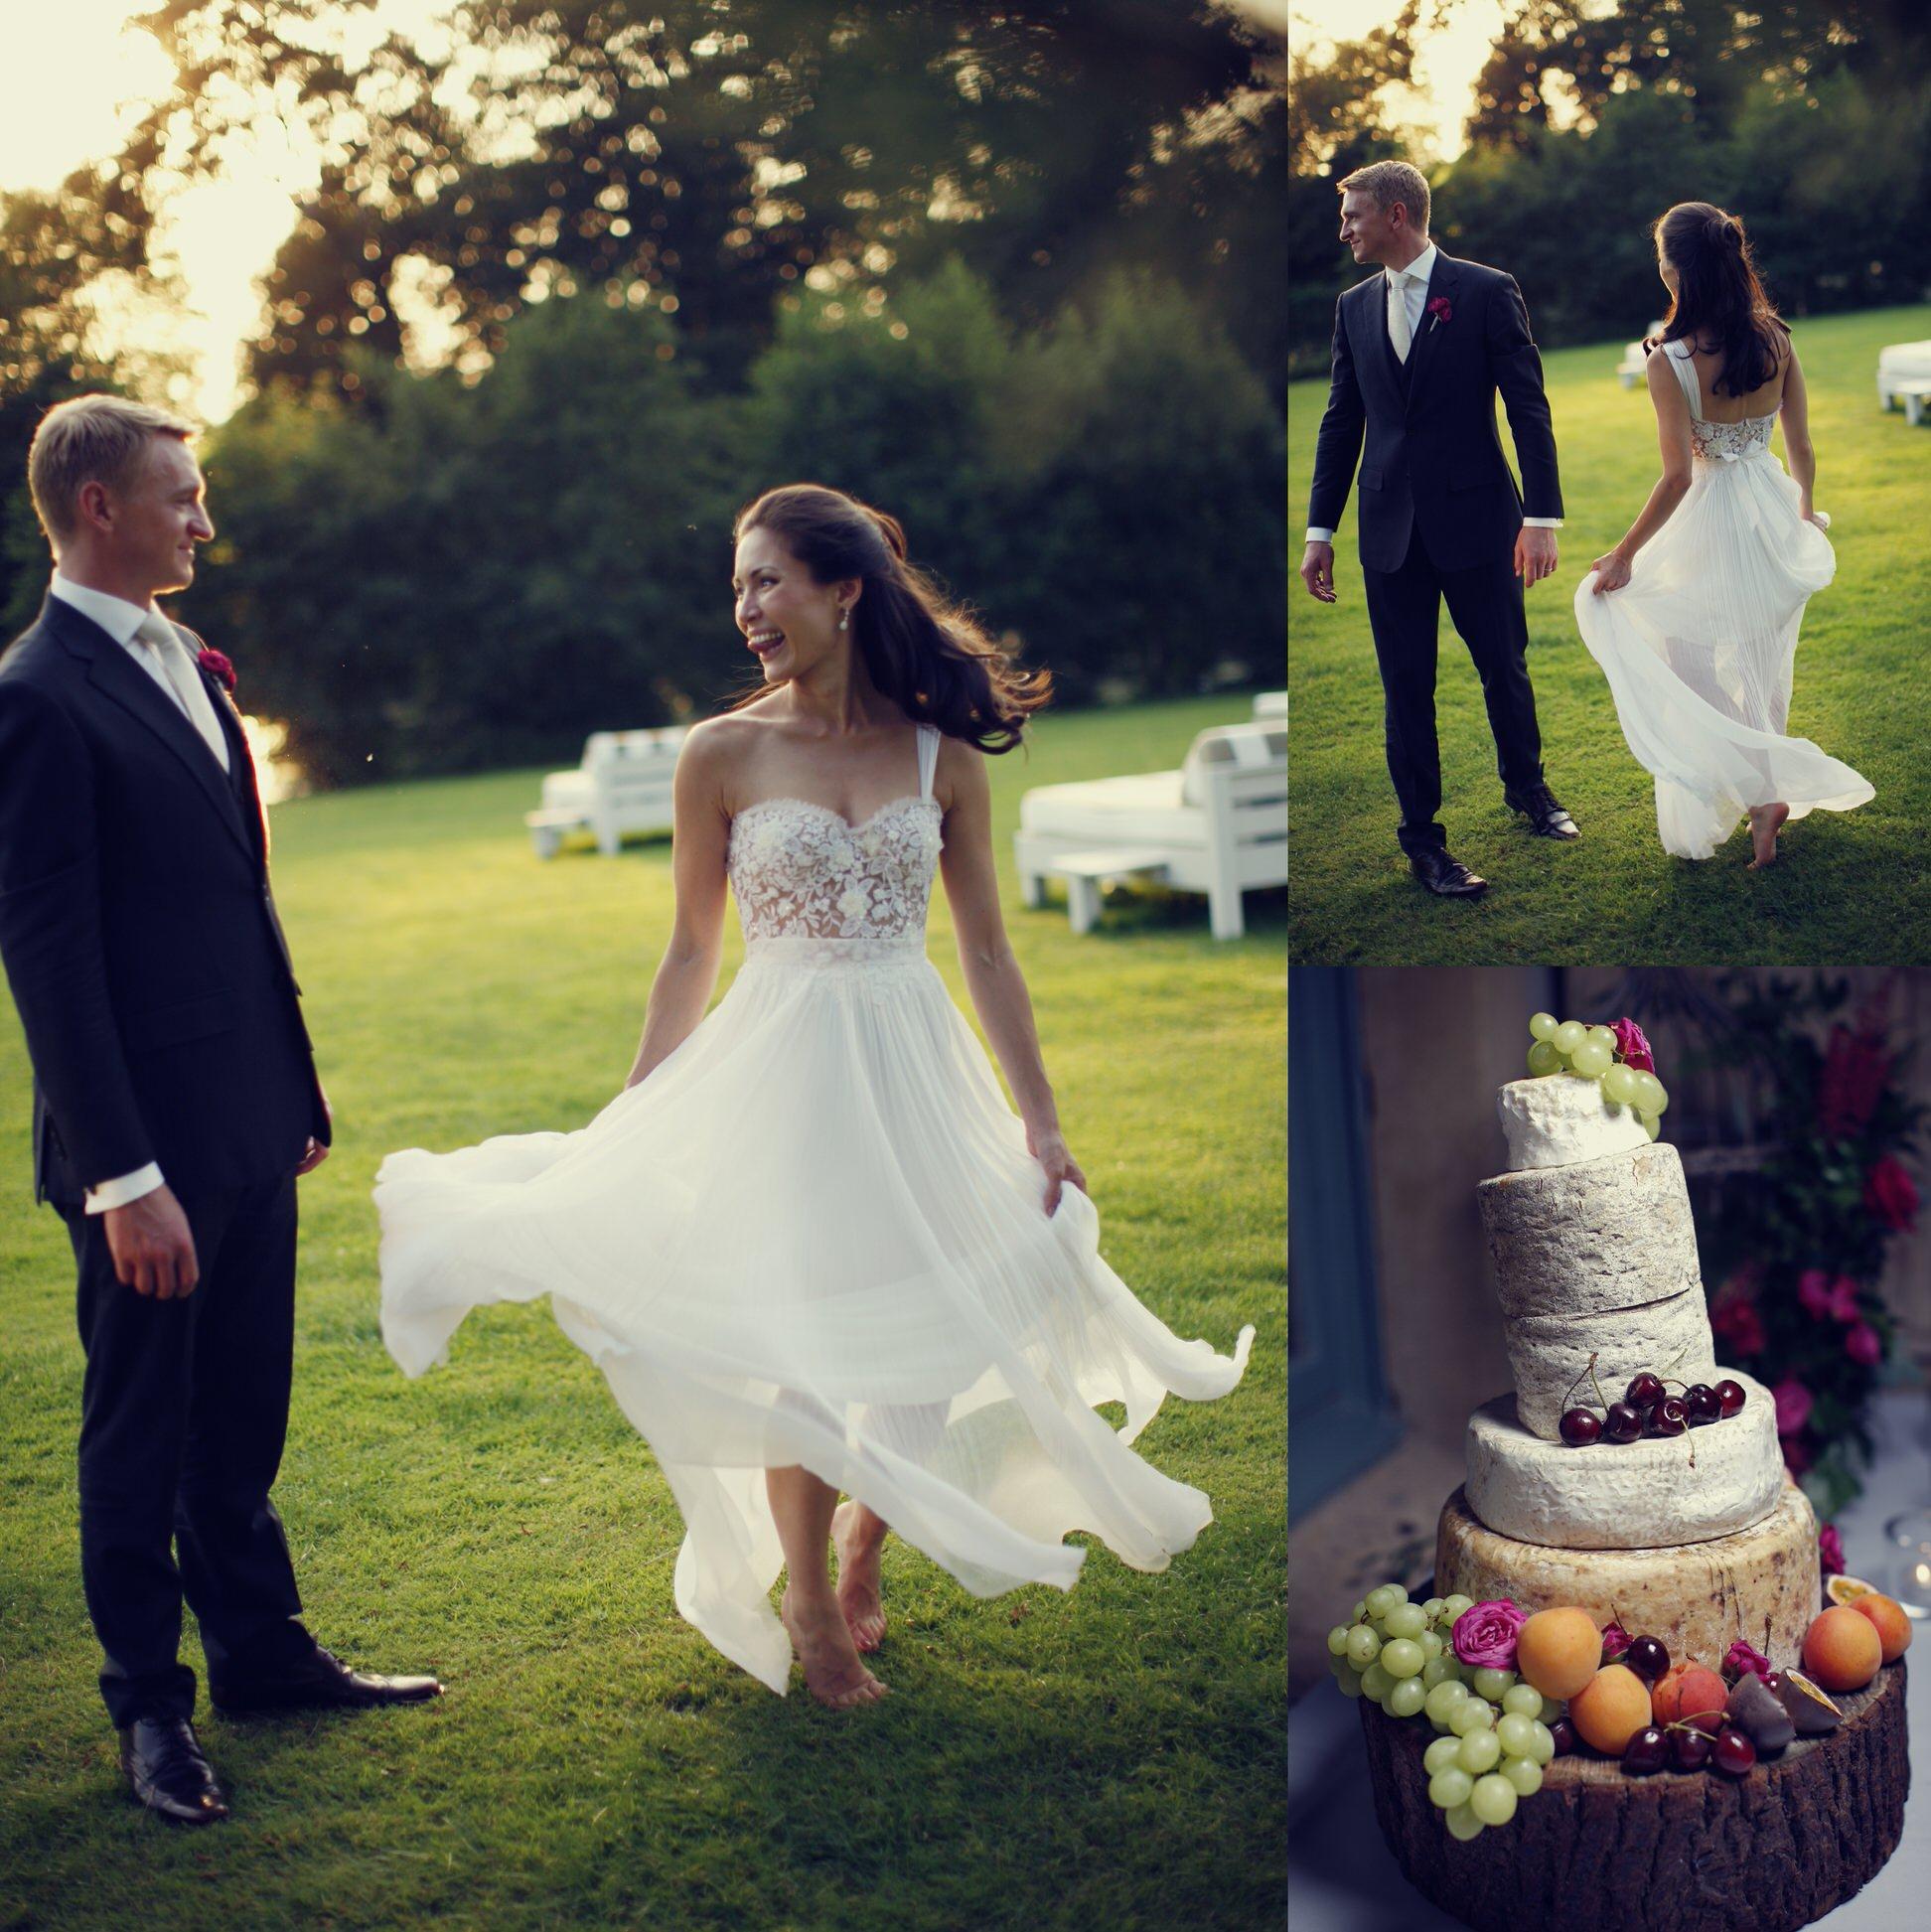 summer-wedding-babington-house-london-weddings_0025.jpg